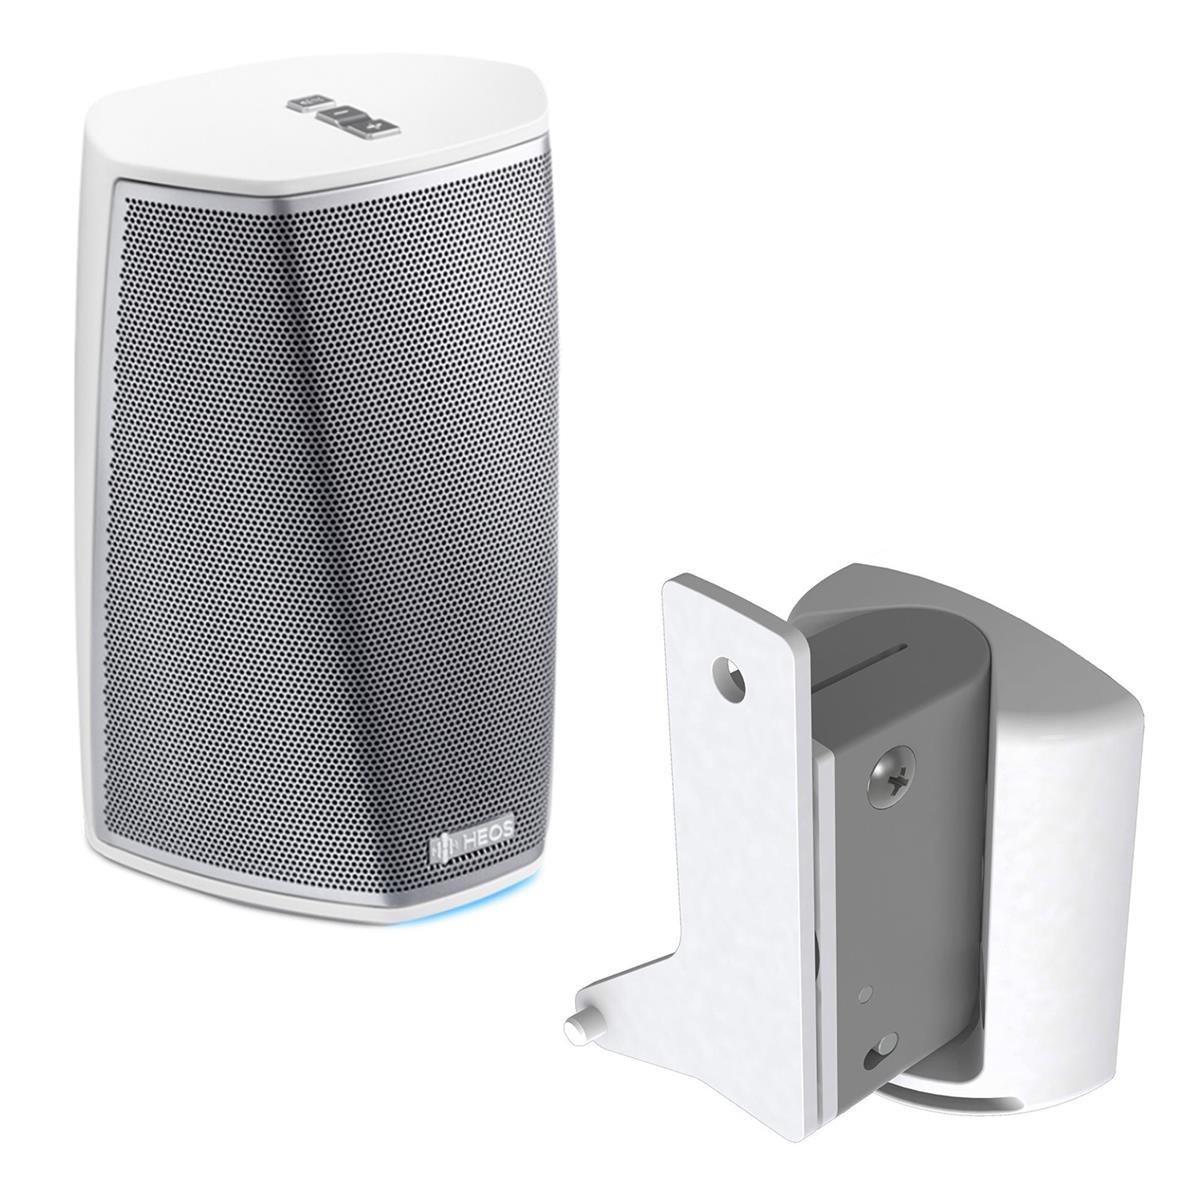 Denon HEOS 1 Wireless Multi-Room Sound System - Series 2 (White) with SoundXtra Wall Mount for Denon HEOS 1 (White)